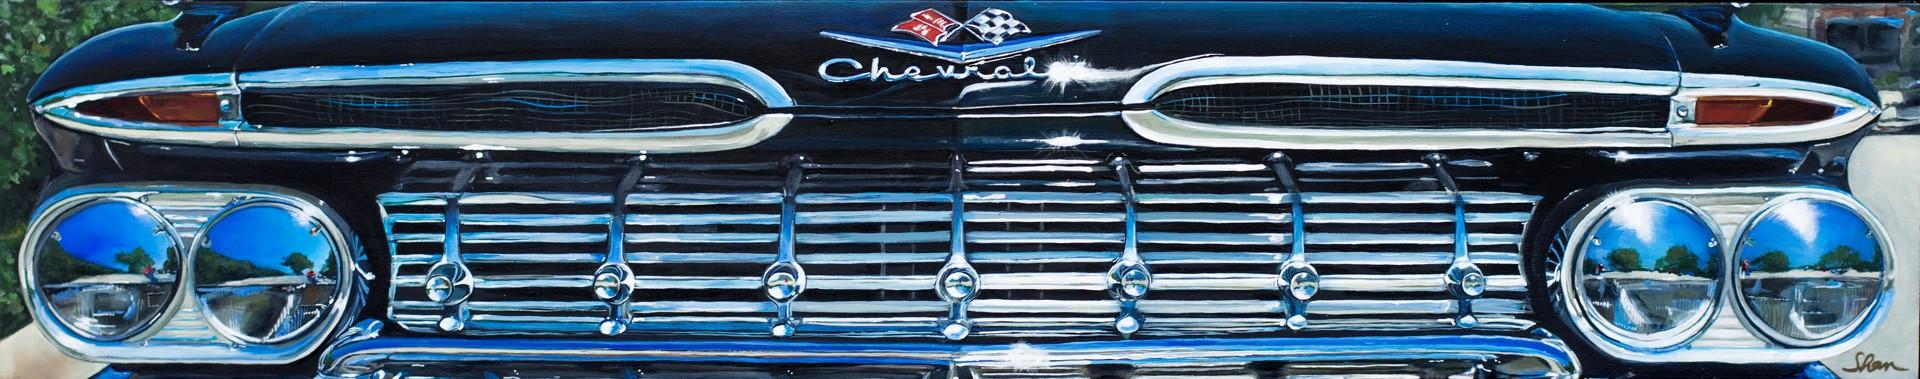 1959 Chevrolet Impala by Shan Fannin